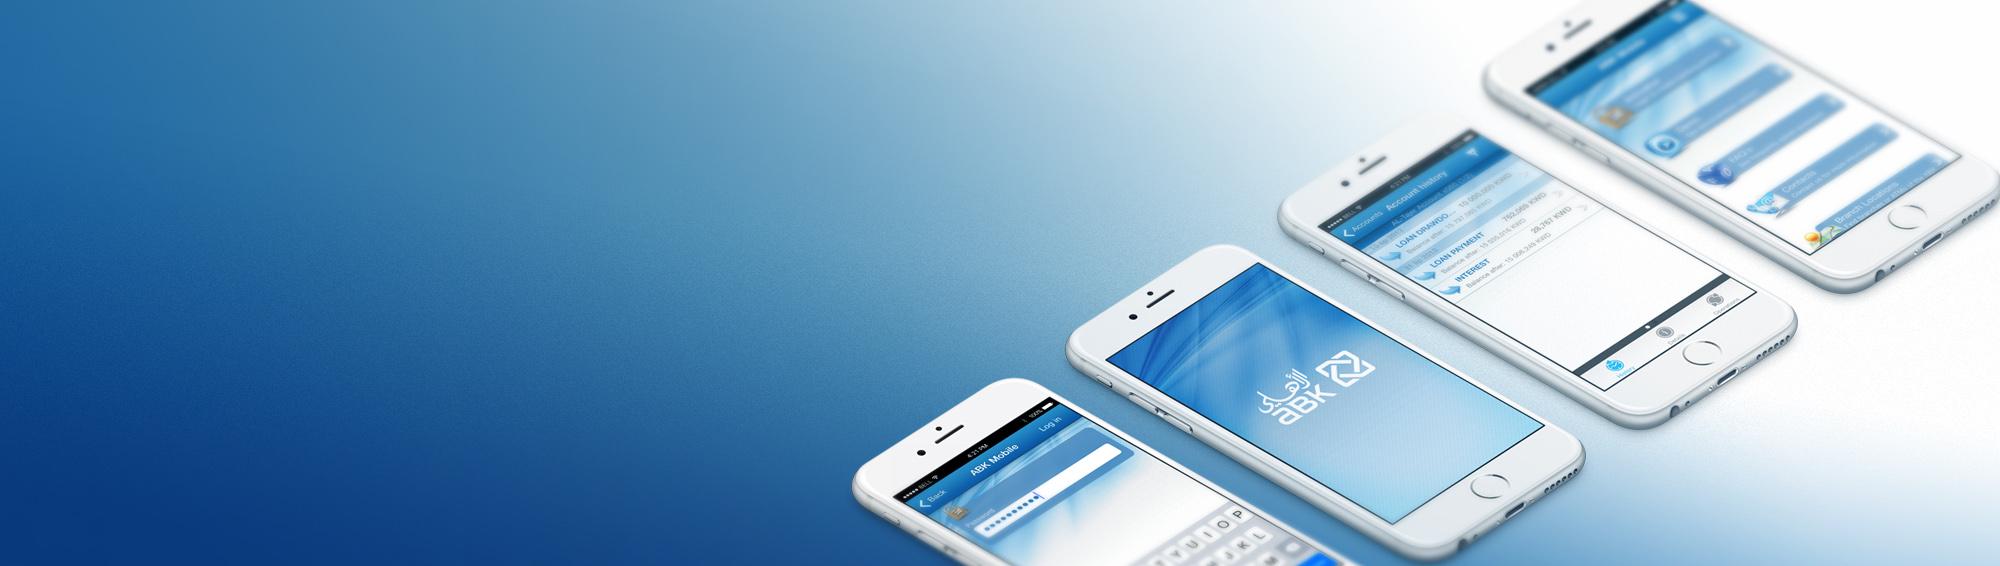 Al Ahli Bank of Kuwait with Finanteq's mobile banking | Mobile Banking  Platforms blog